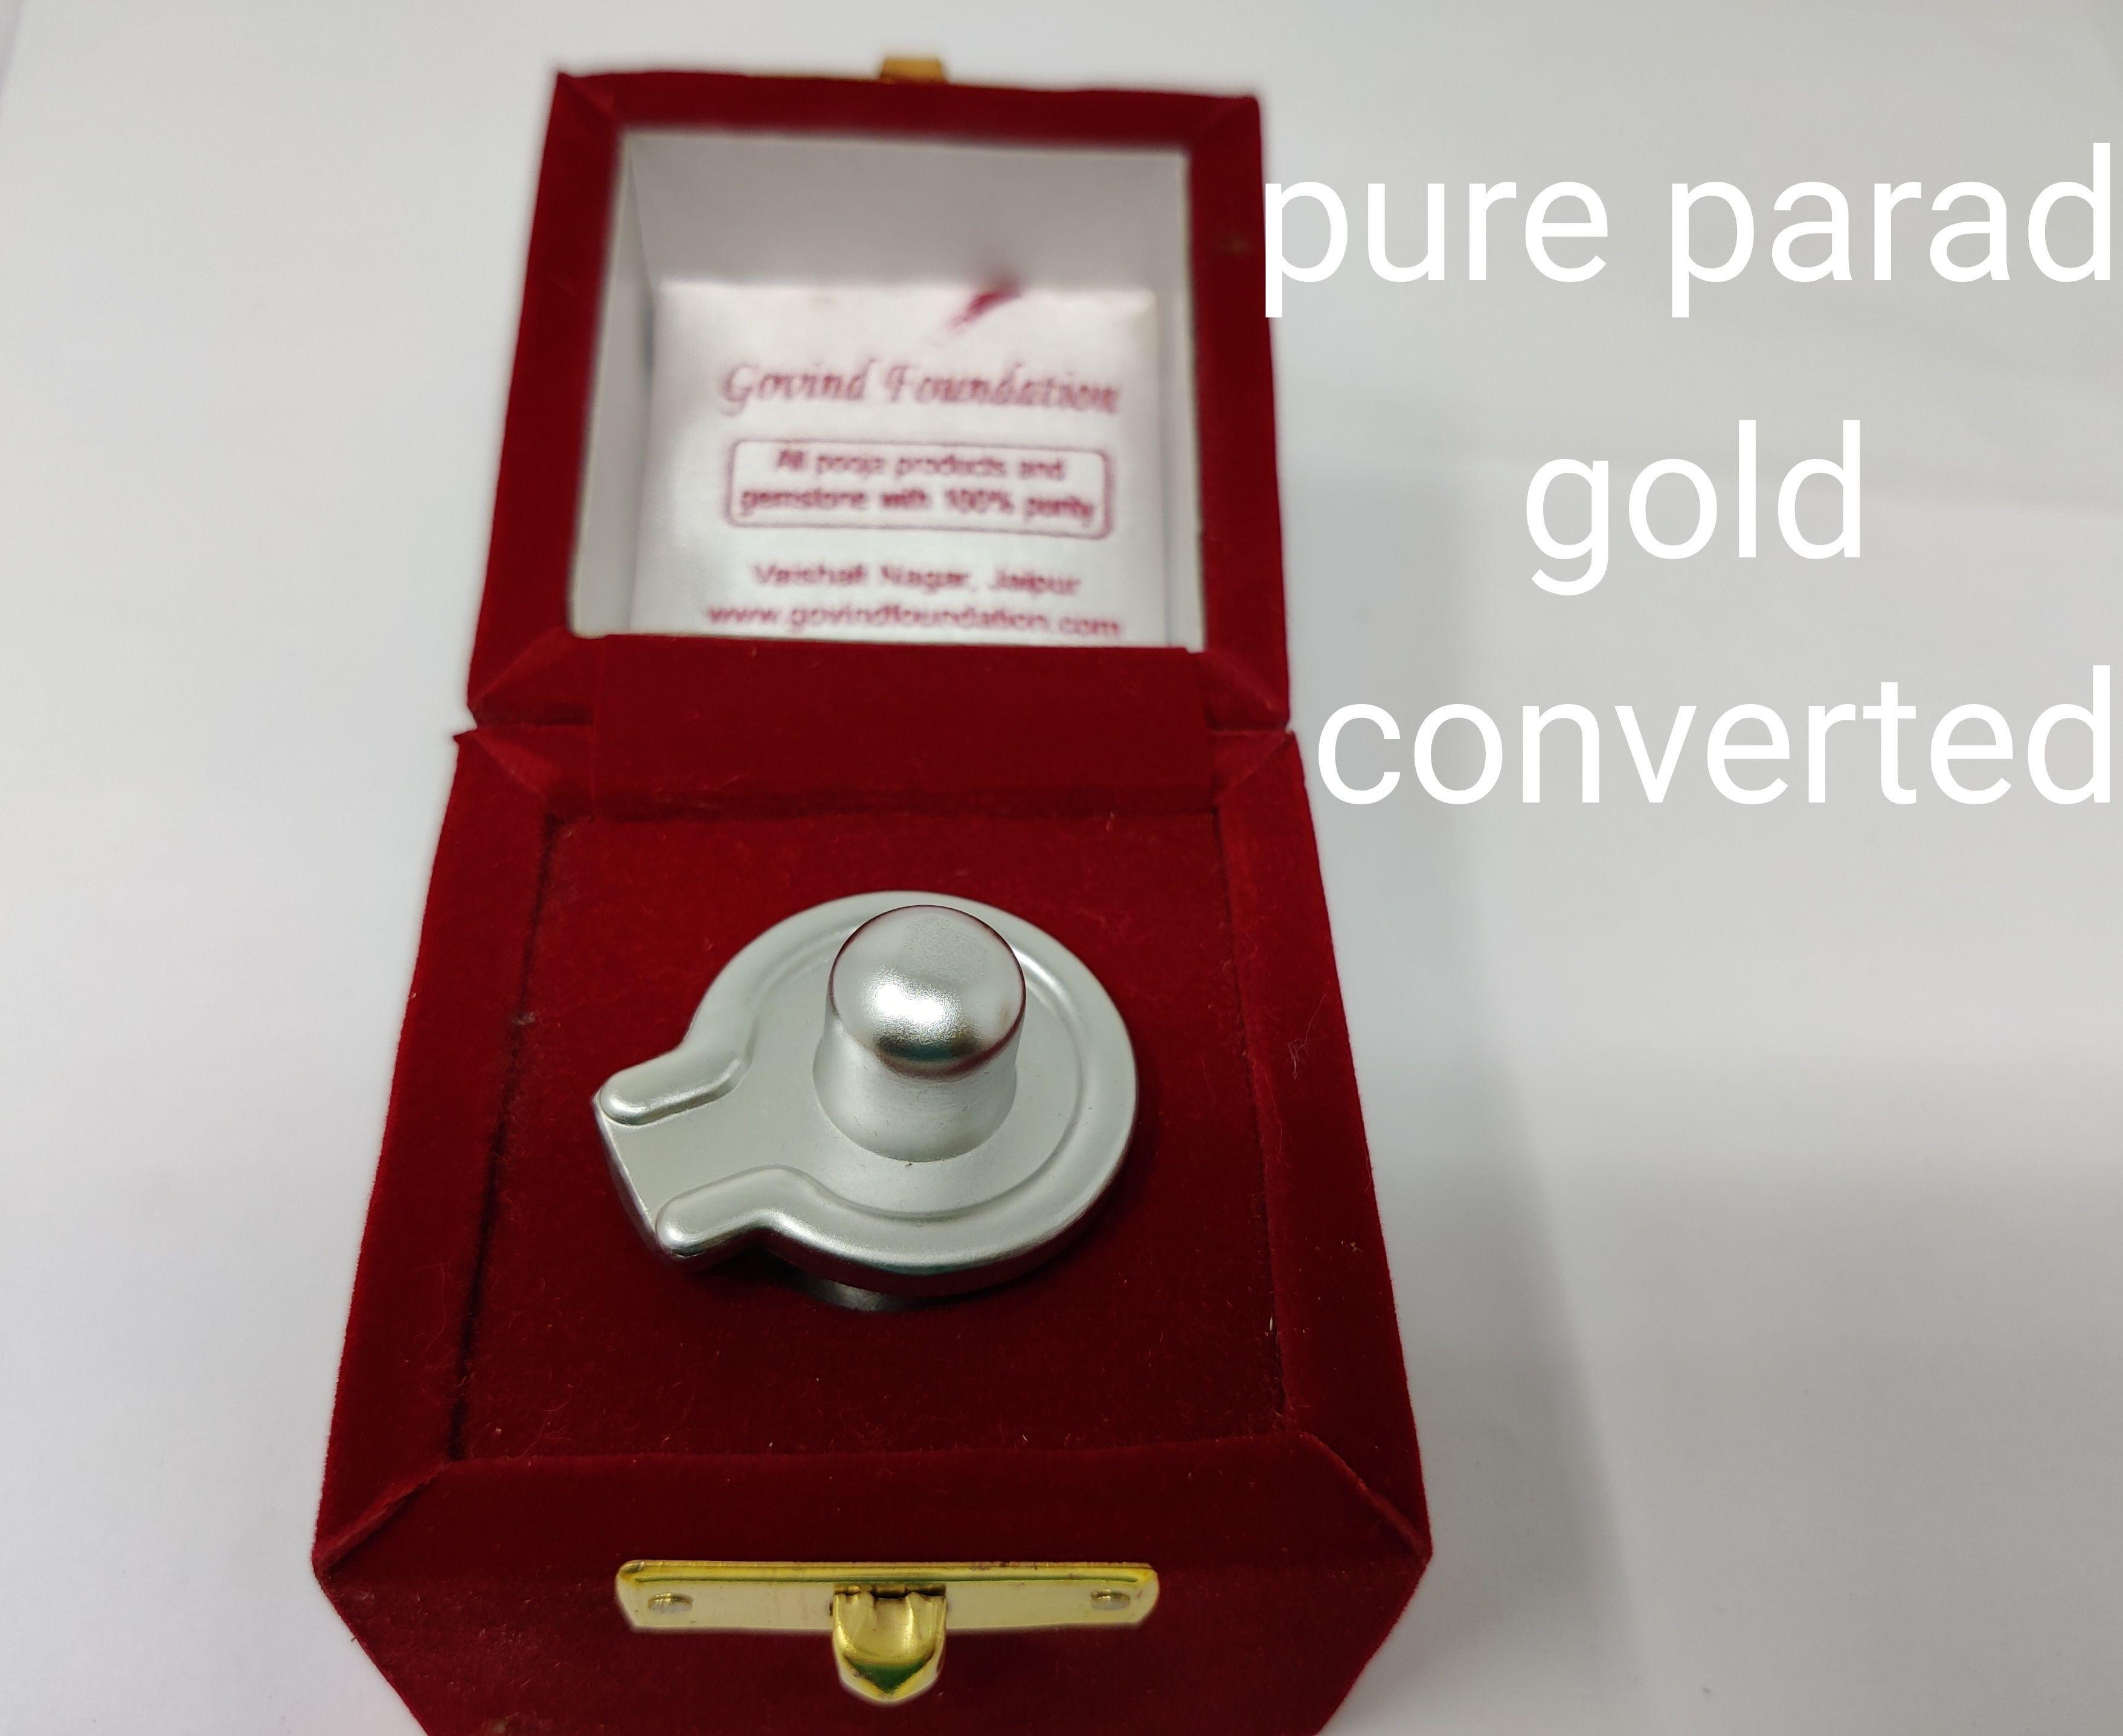 Pure parad shivling gold converted mercury shivling 90 gm